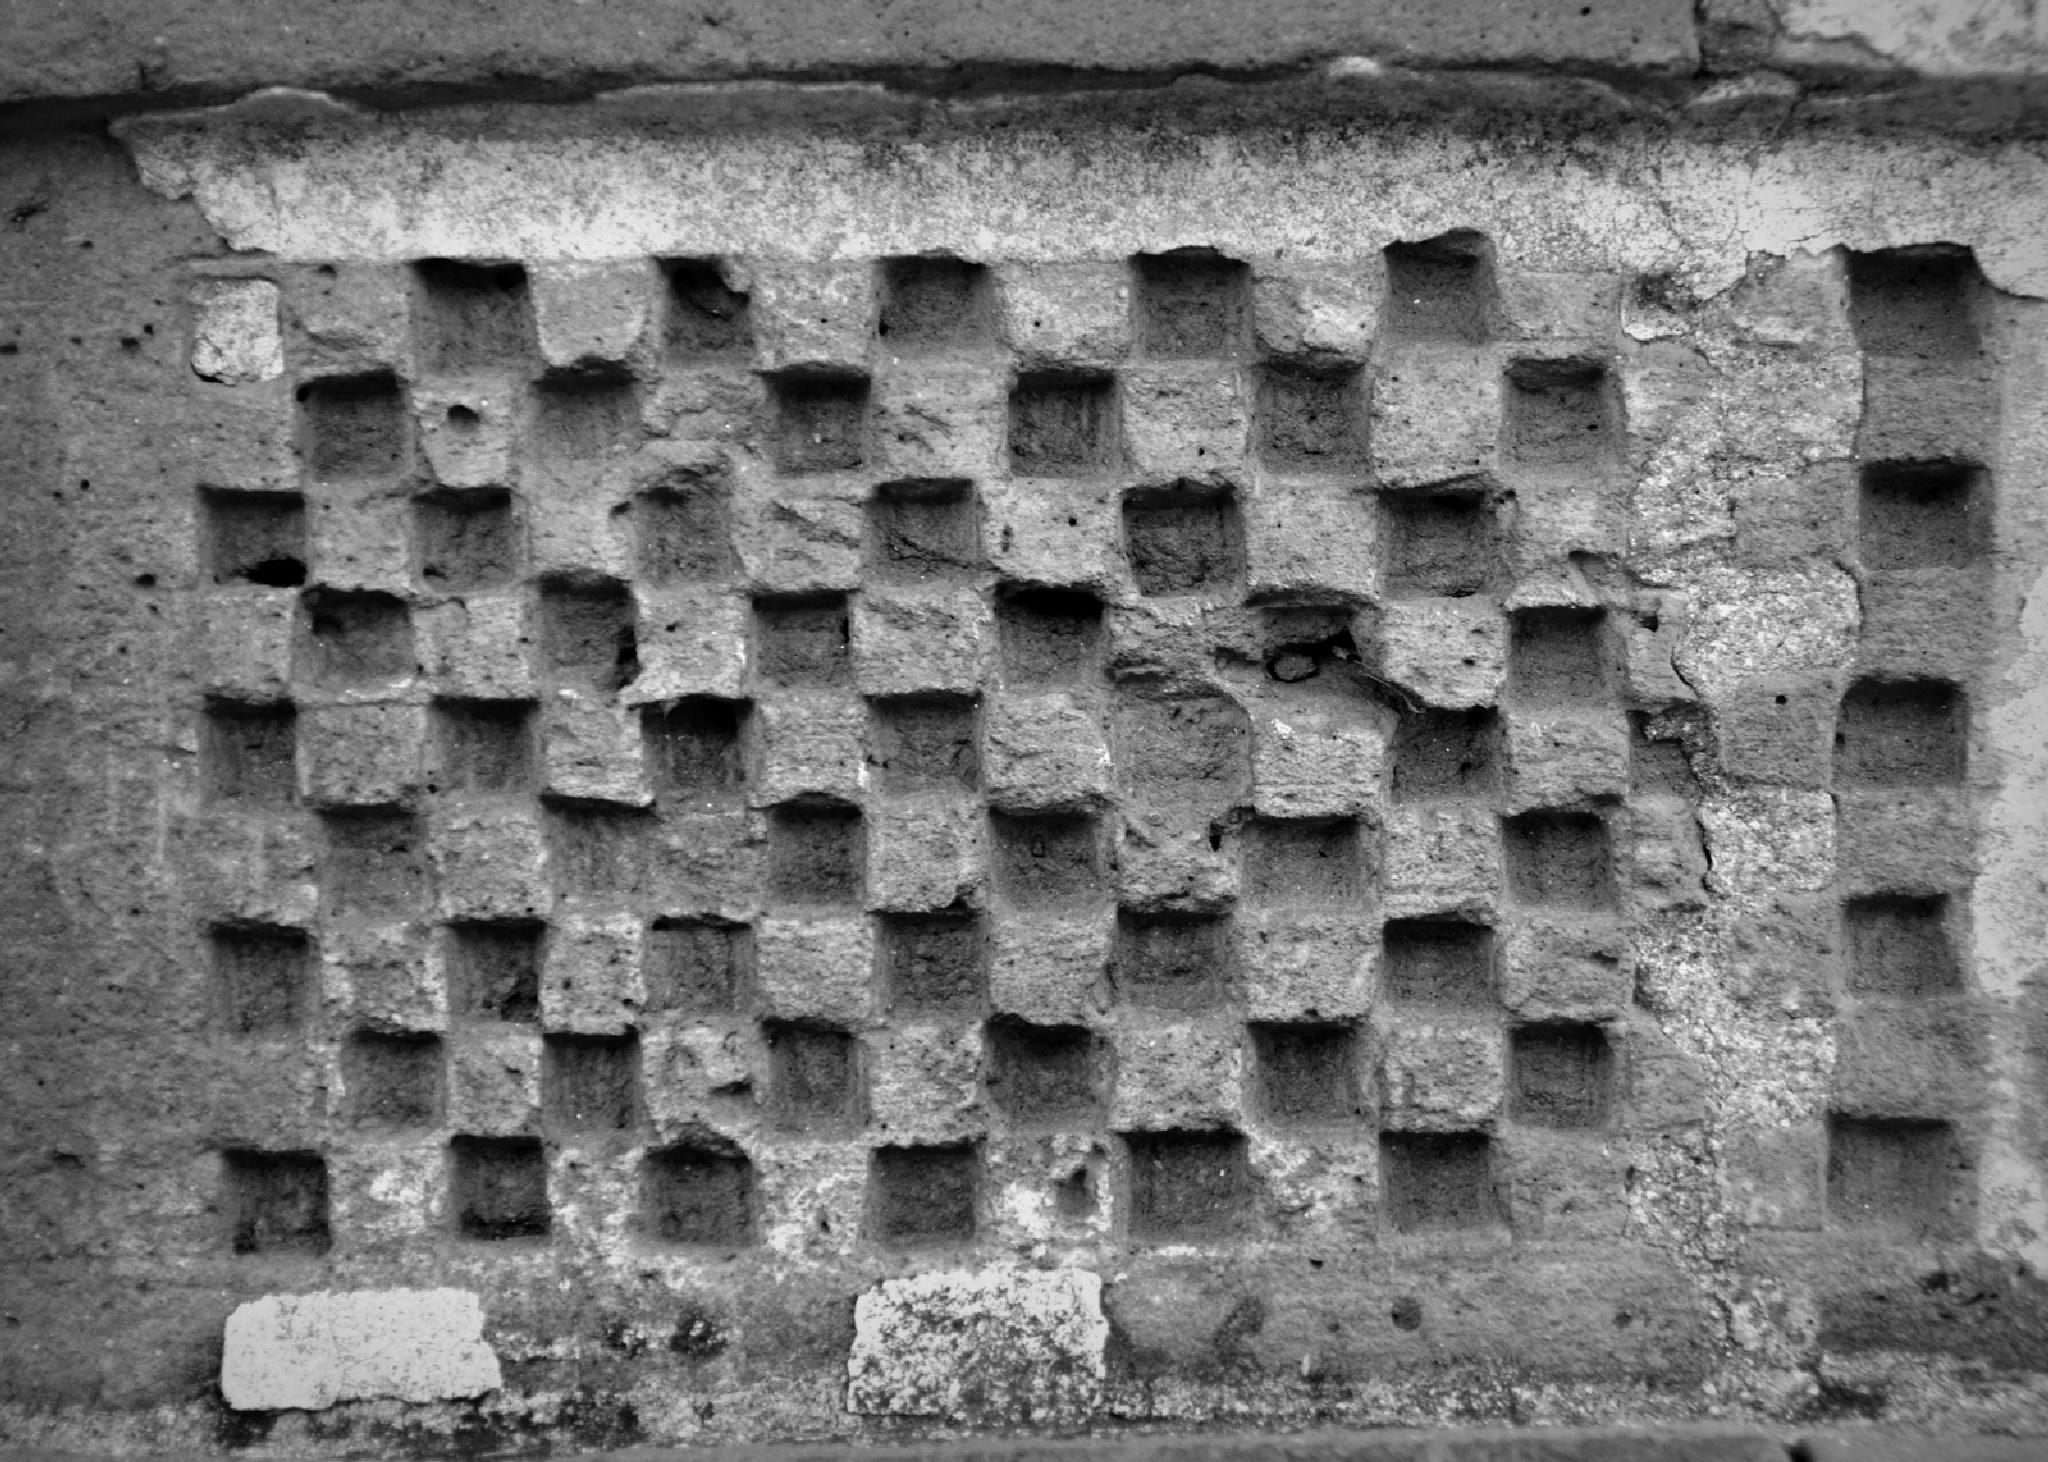 Terracotta by Anubrata Mondal